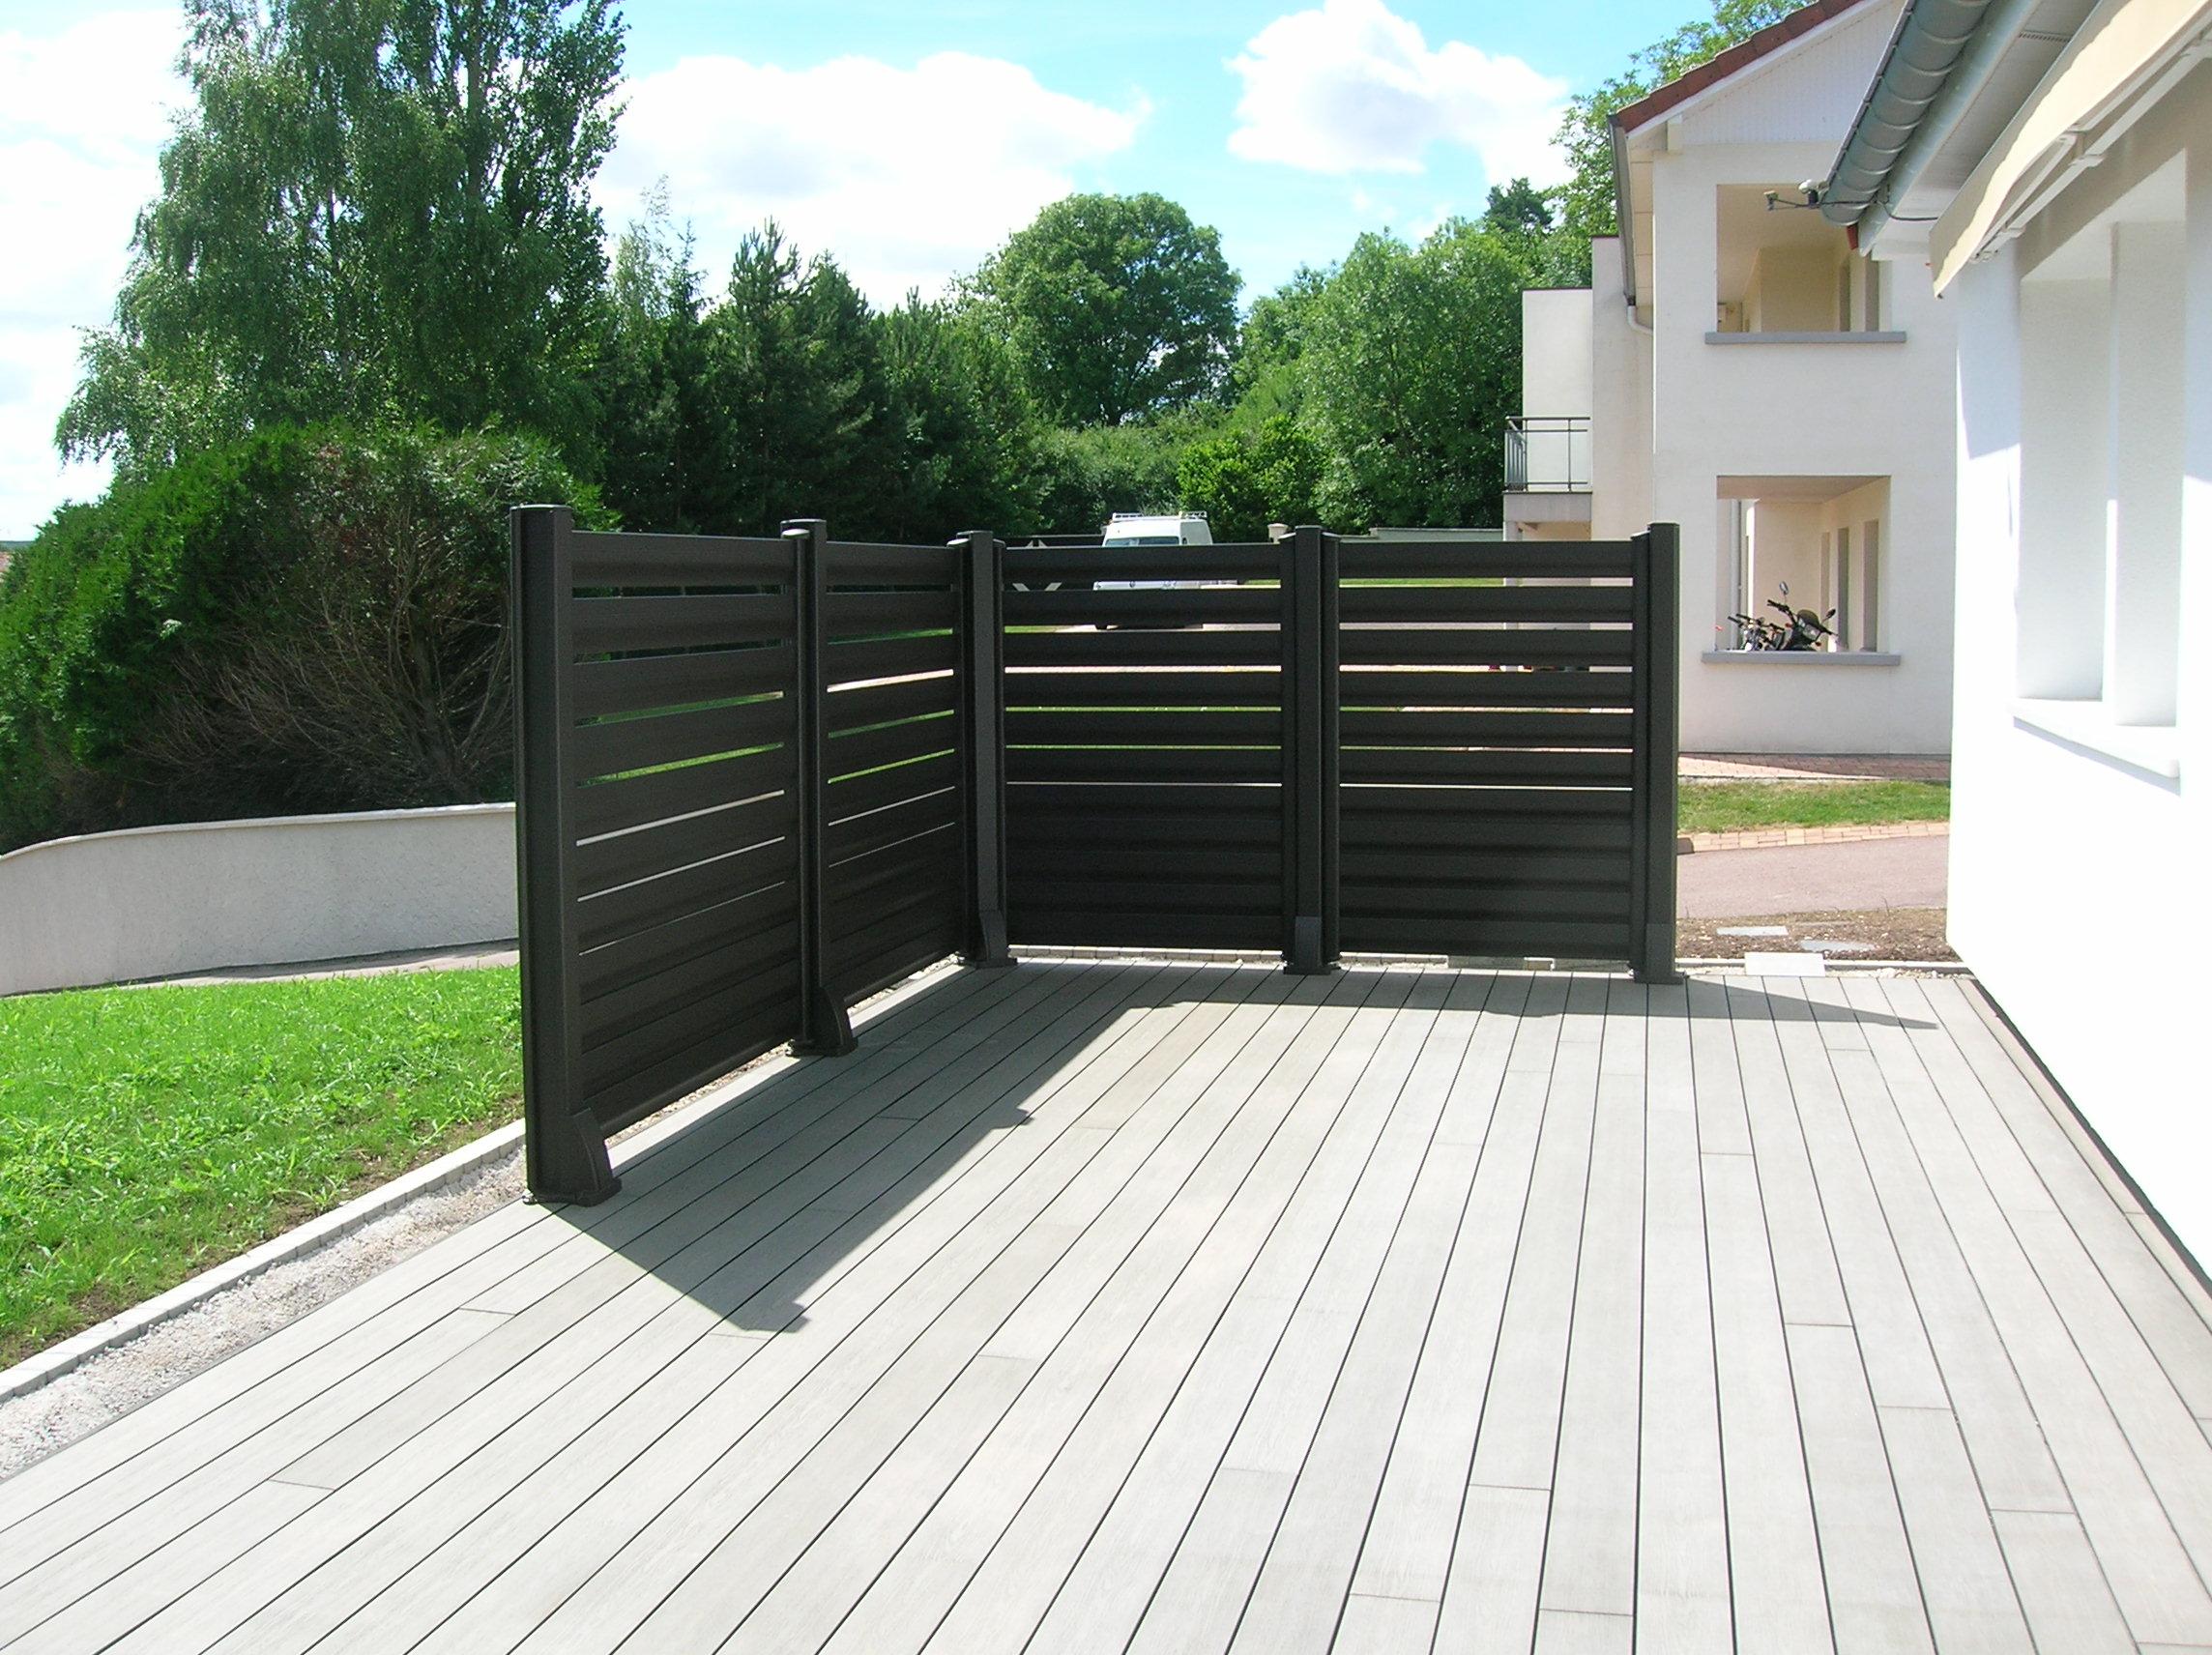 Tailacreaciones: Brise Vue Jardin Aluminium encequiconcerne Cache Vue Jardin